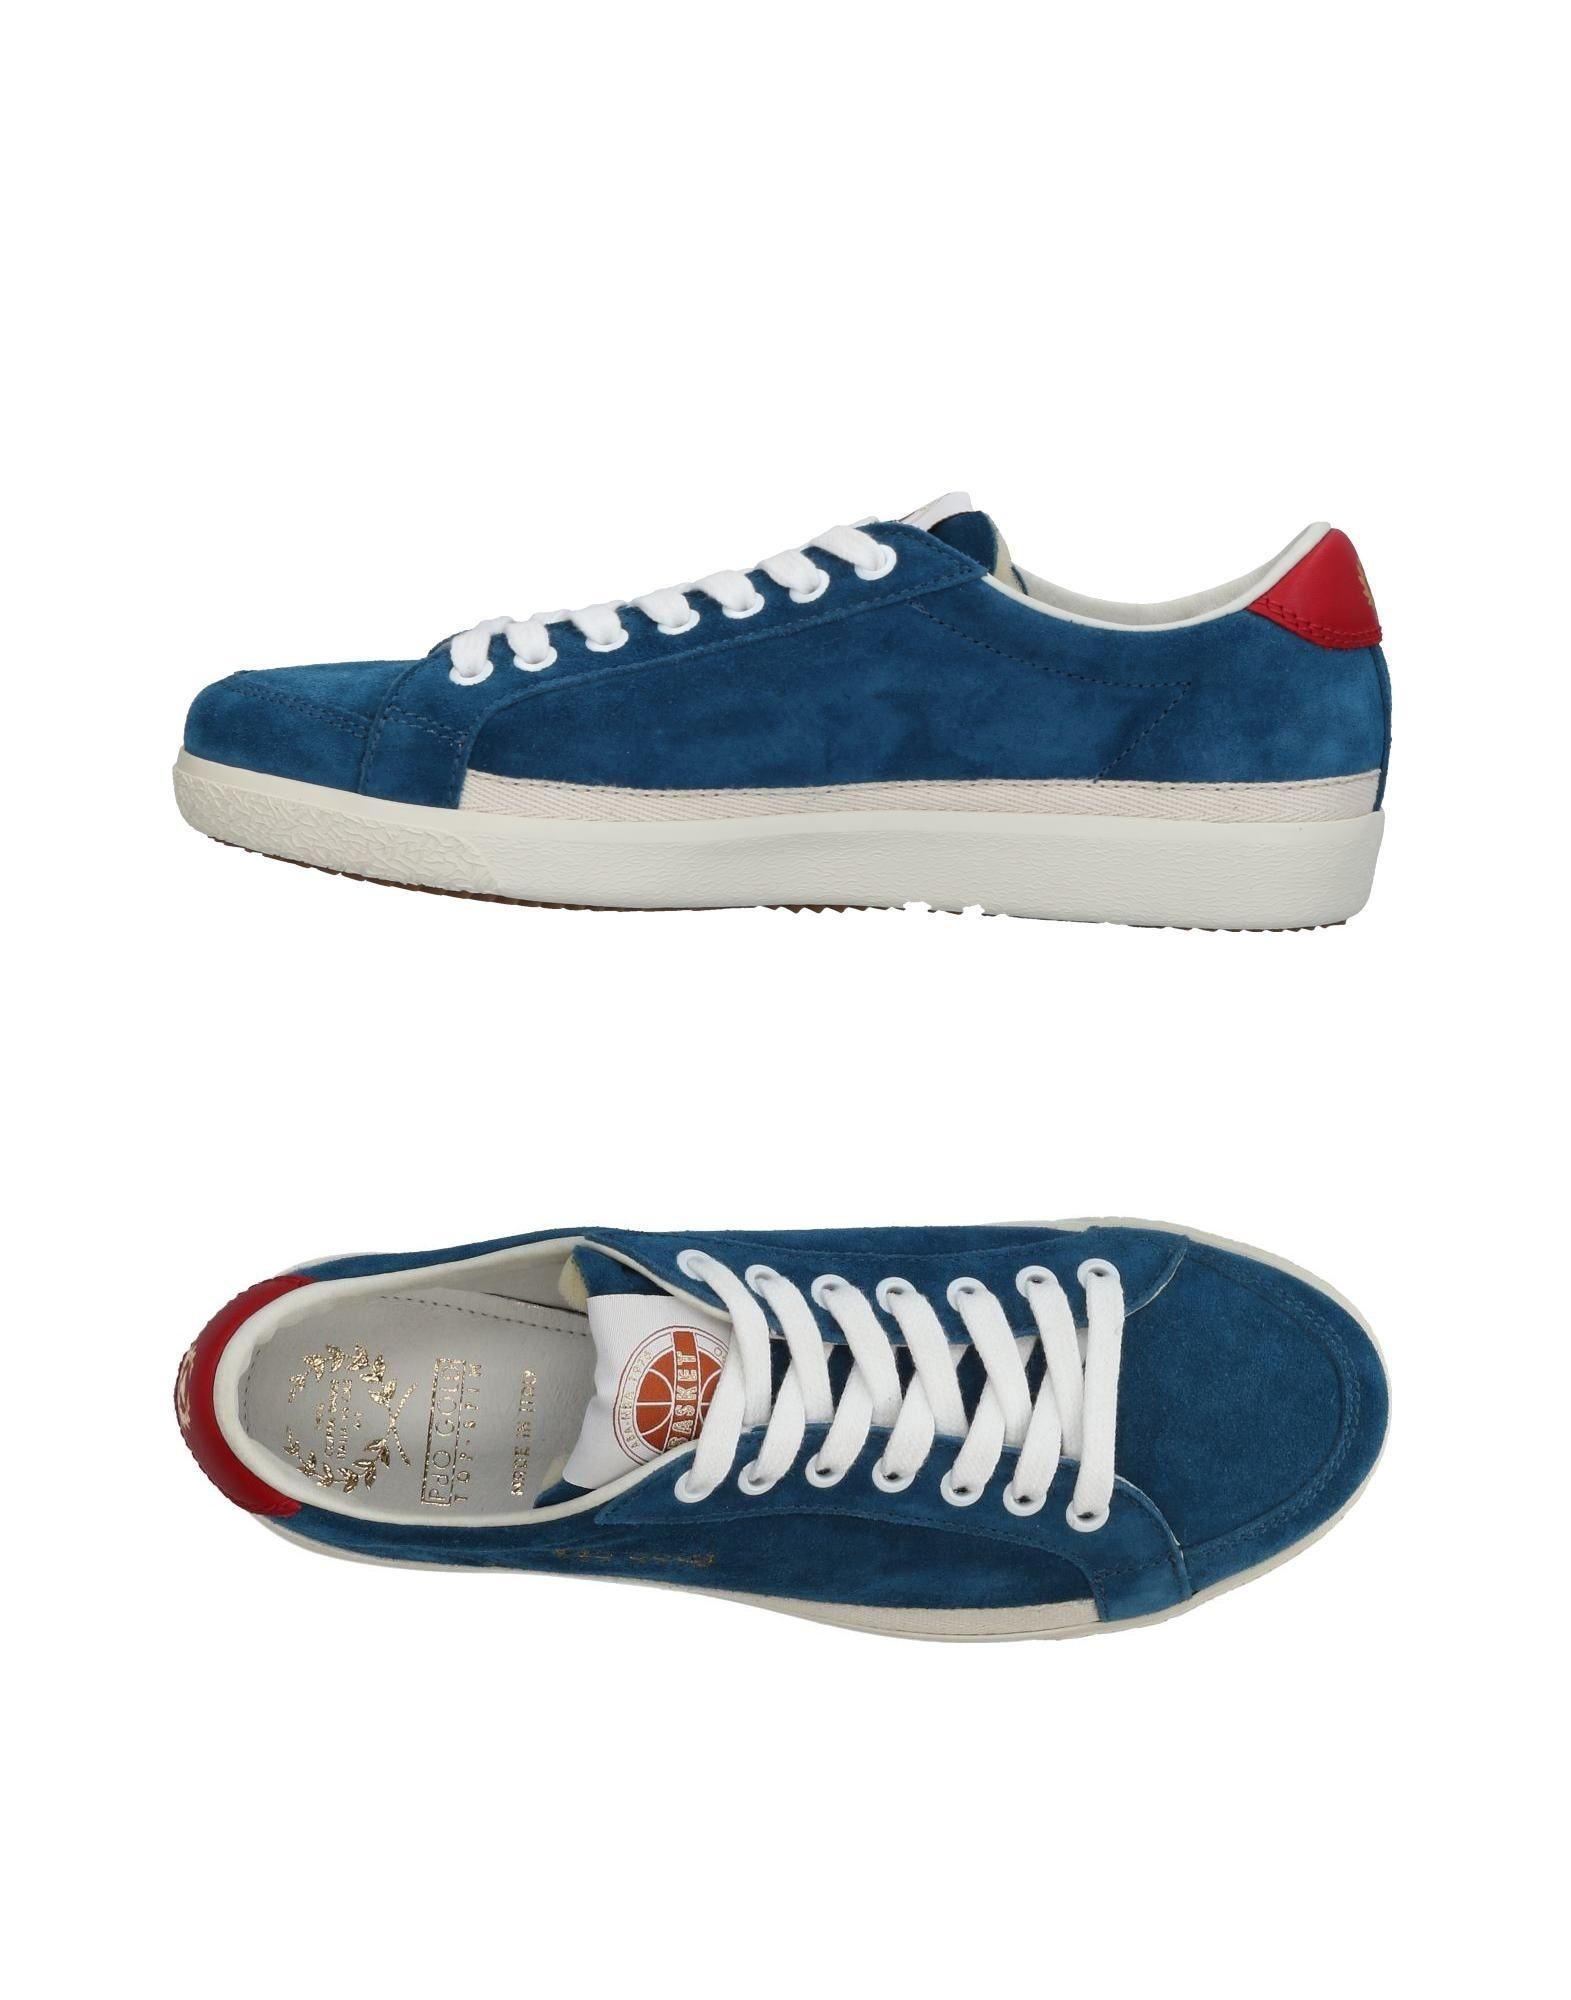 Rabatt echte Schuhe Pantofola D'oro Sneakers Herren  11153947LI